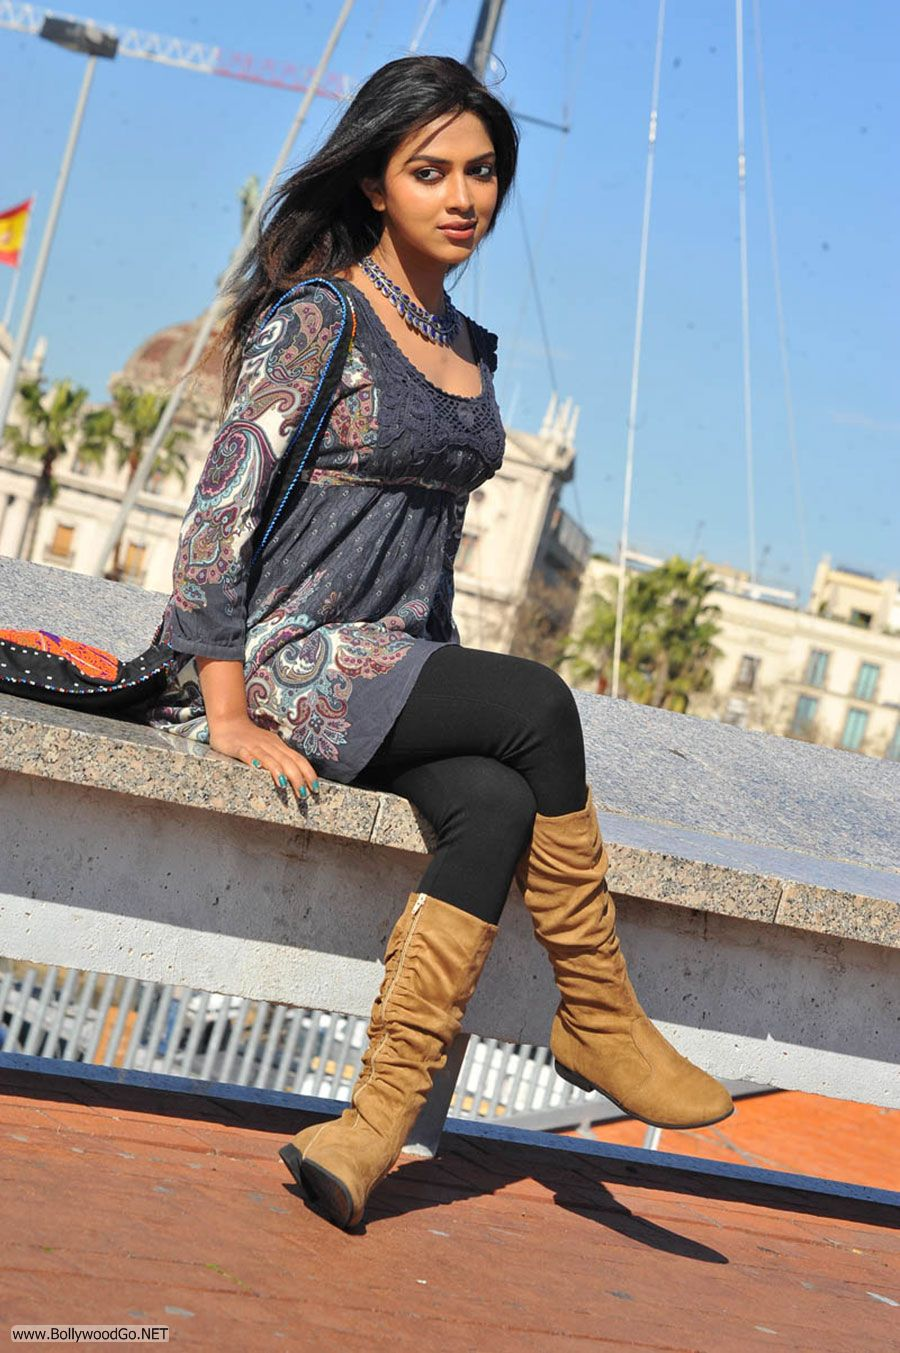 Amala Paul New Stills from Iddarammayilatho Movie AbfeXDc5